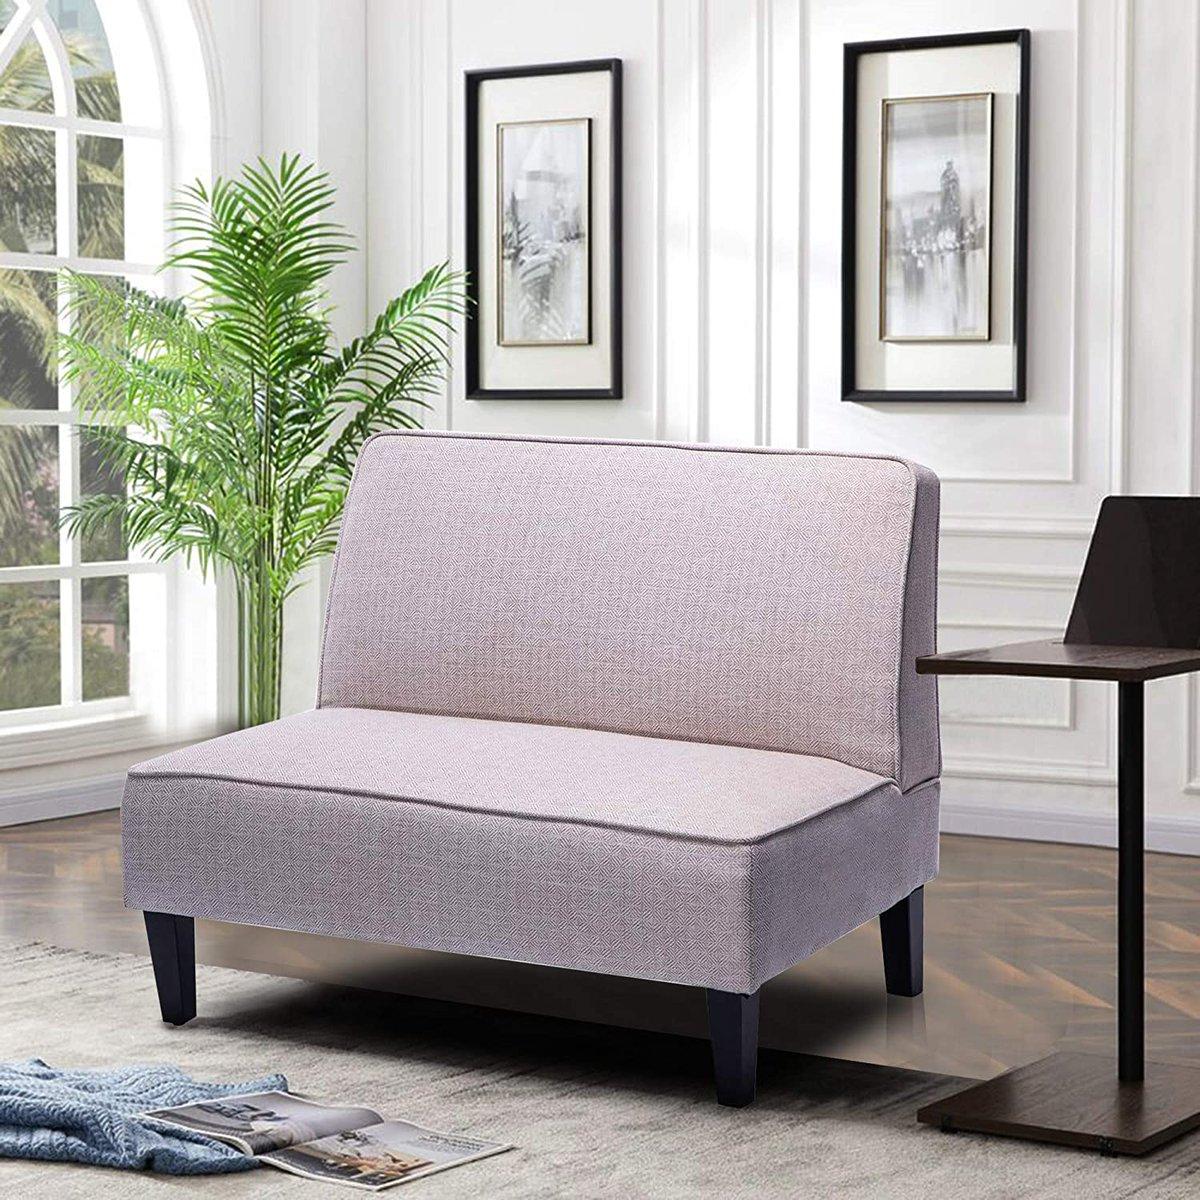 Sharing beautiful #loveseat #settee #Amazon👉… #Loaf #Couch #cosy #relax #interiordesign #bench #sofa #design #furniture #livingroom #dinningroom #interior #interiorandliving #homeandliving #SundayThoughts #Sundaymotivation #home #Sundaymorning #Sundayvibe